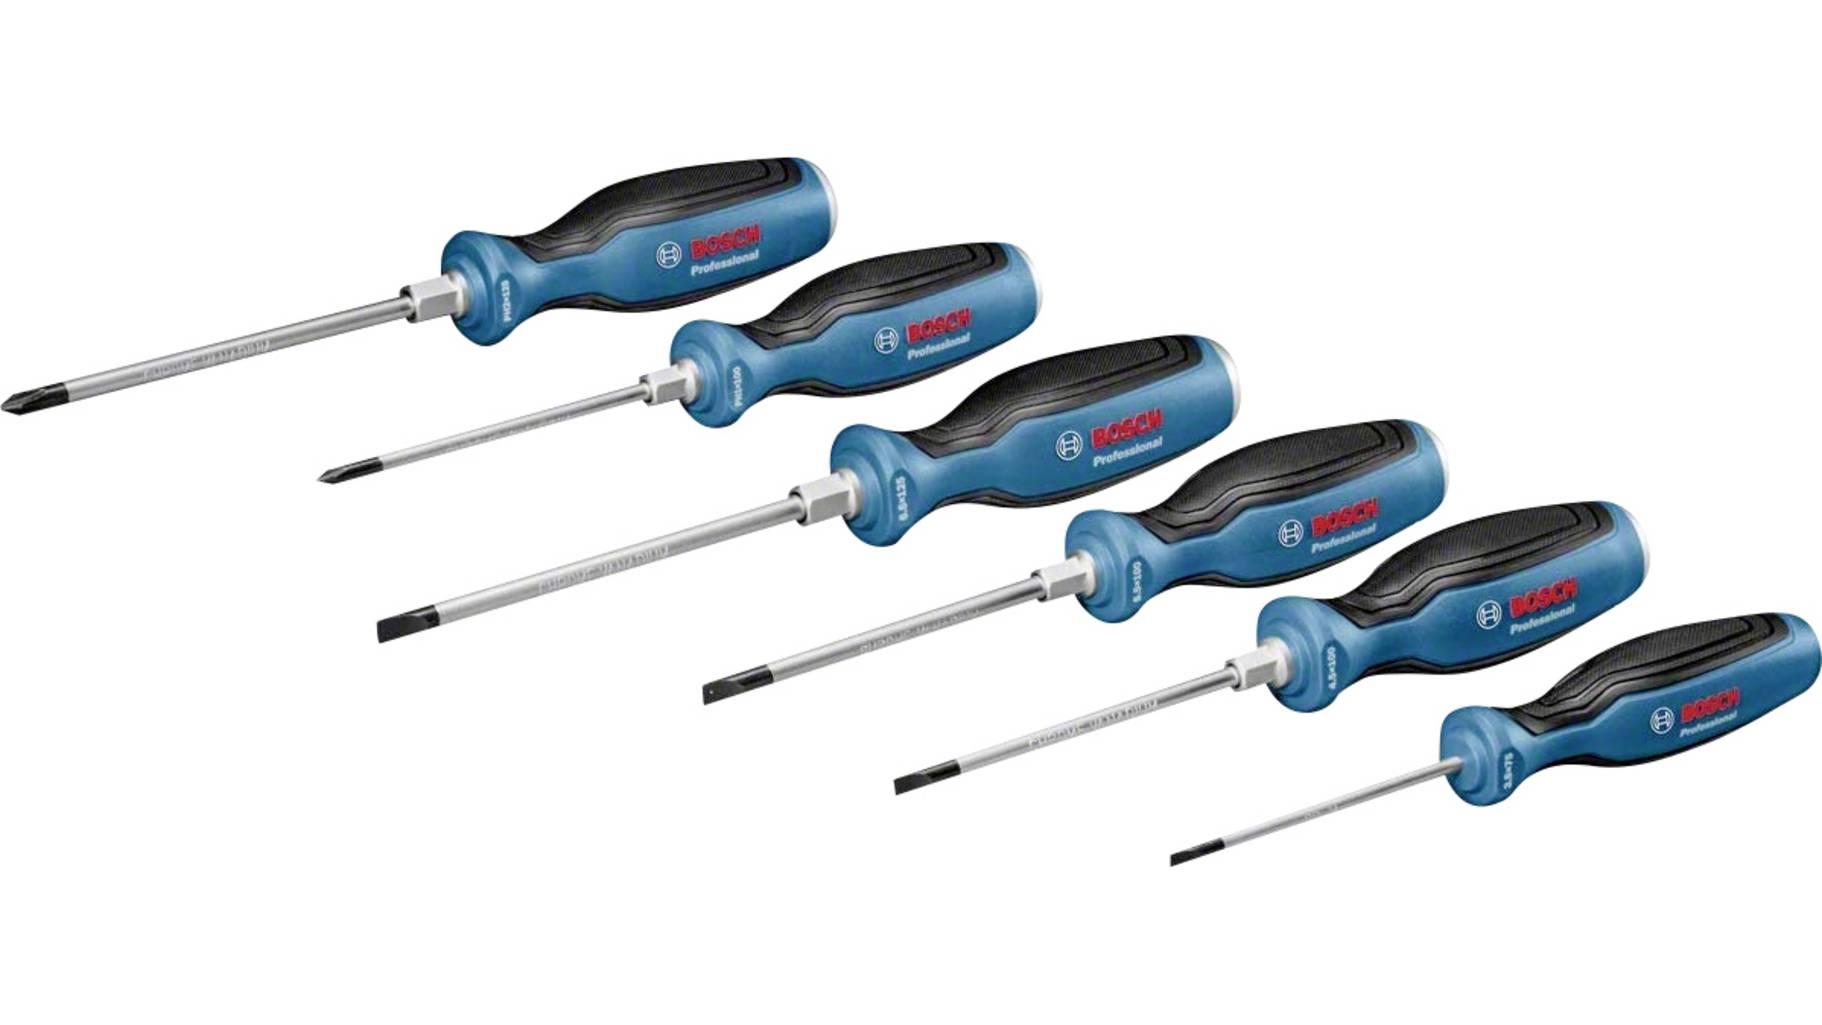 Bosch Professional 6 tlg. Schraubendreher-Set / PH 125 mm, PH 100 mm, SL6.5 125 mm, SL5.5 100 mm, SL4.5 100 mm, SL3.5 75 mm, L-Boxx-Einlage